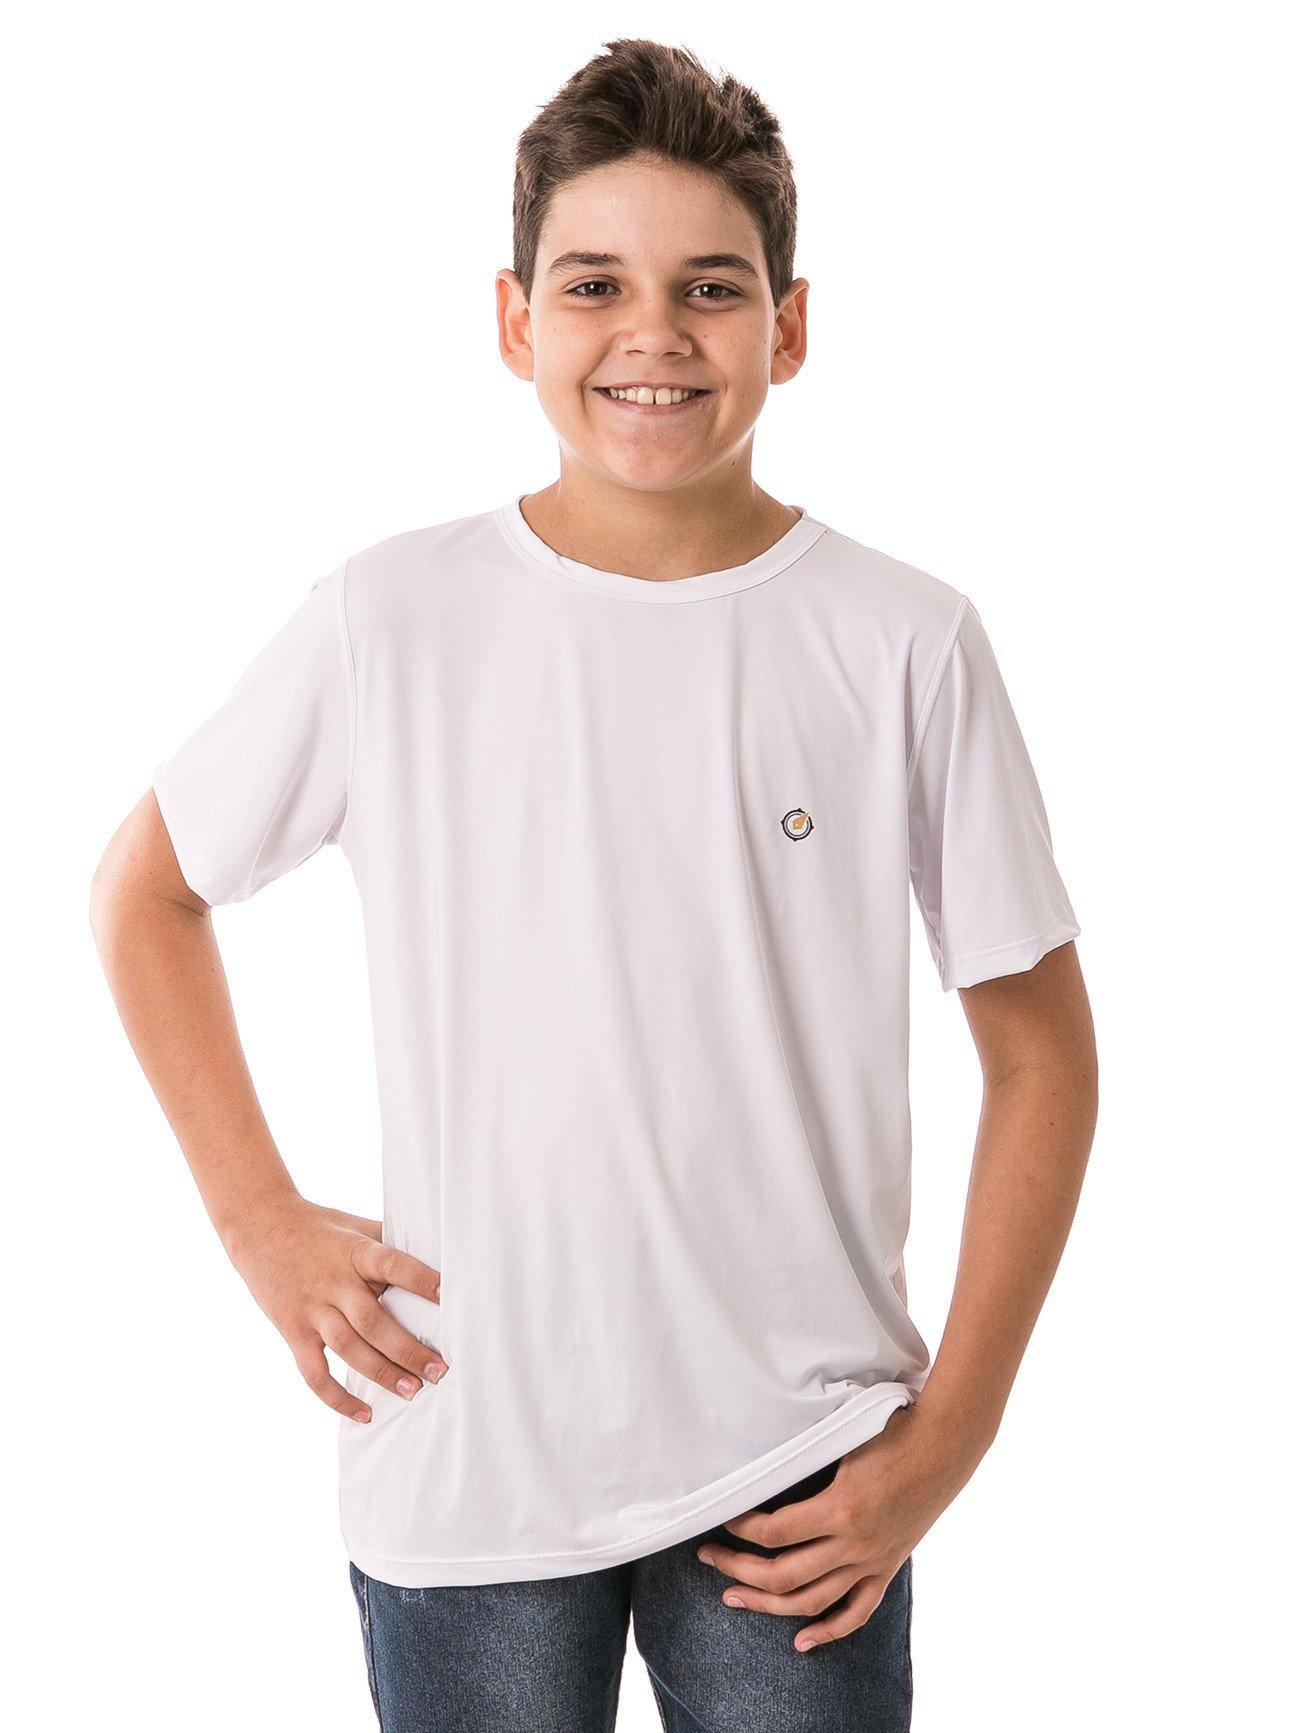 infantil masculinas t shirt curta ice branco frente 2 b